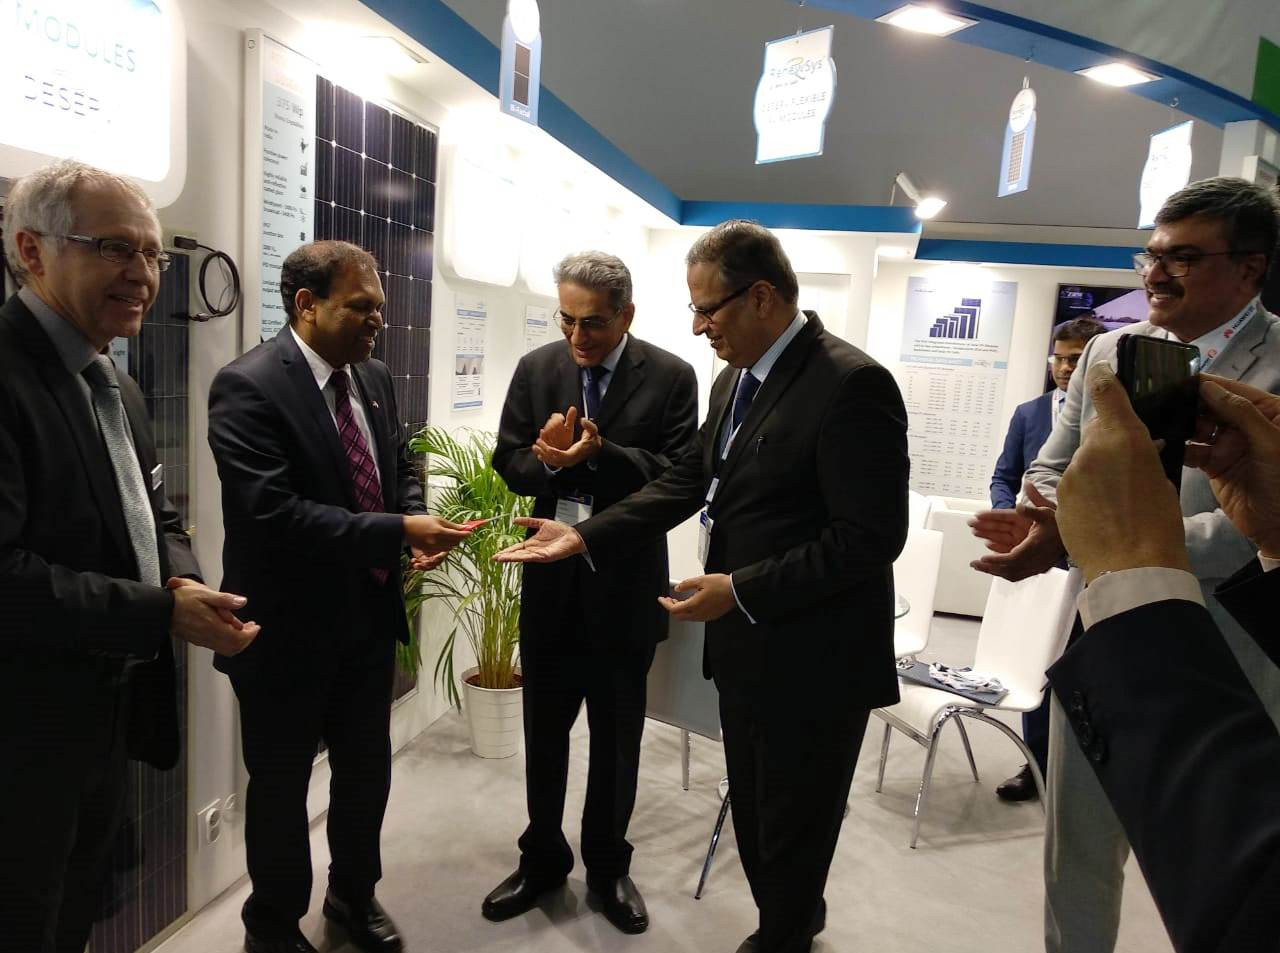 Mr. Sugandh rajaram visits RenewSys stal